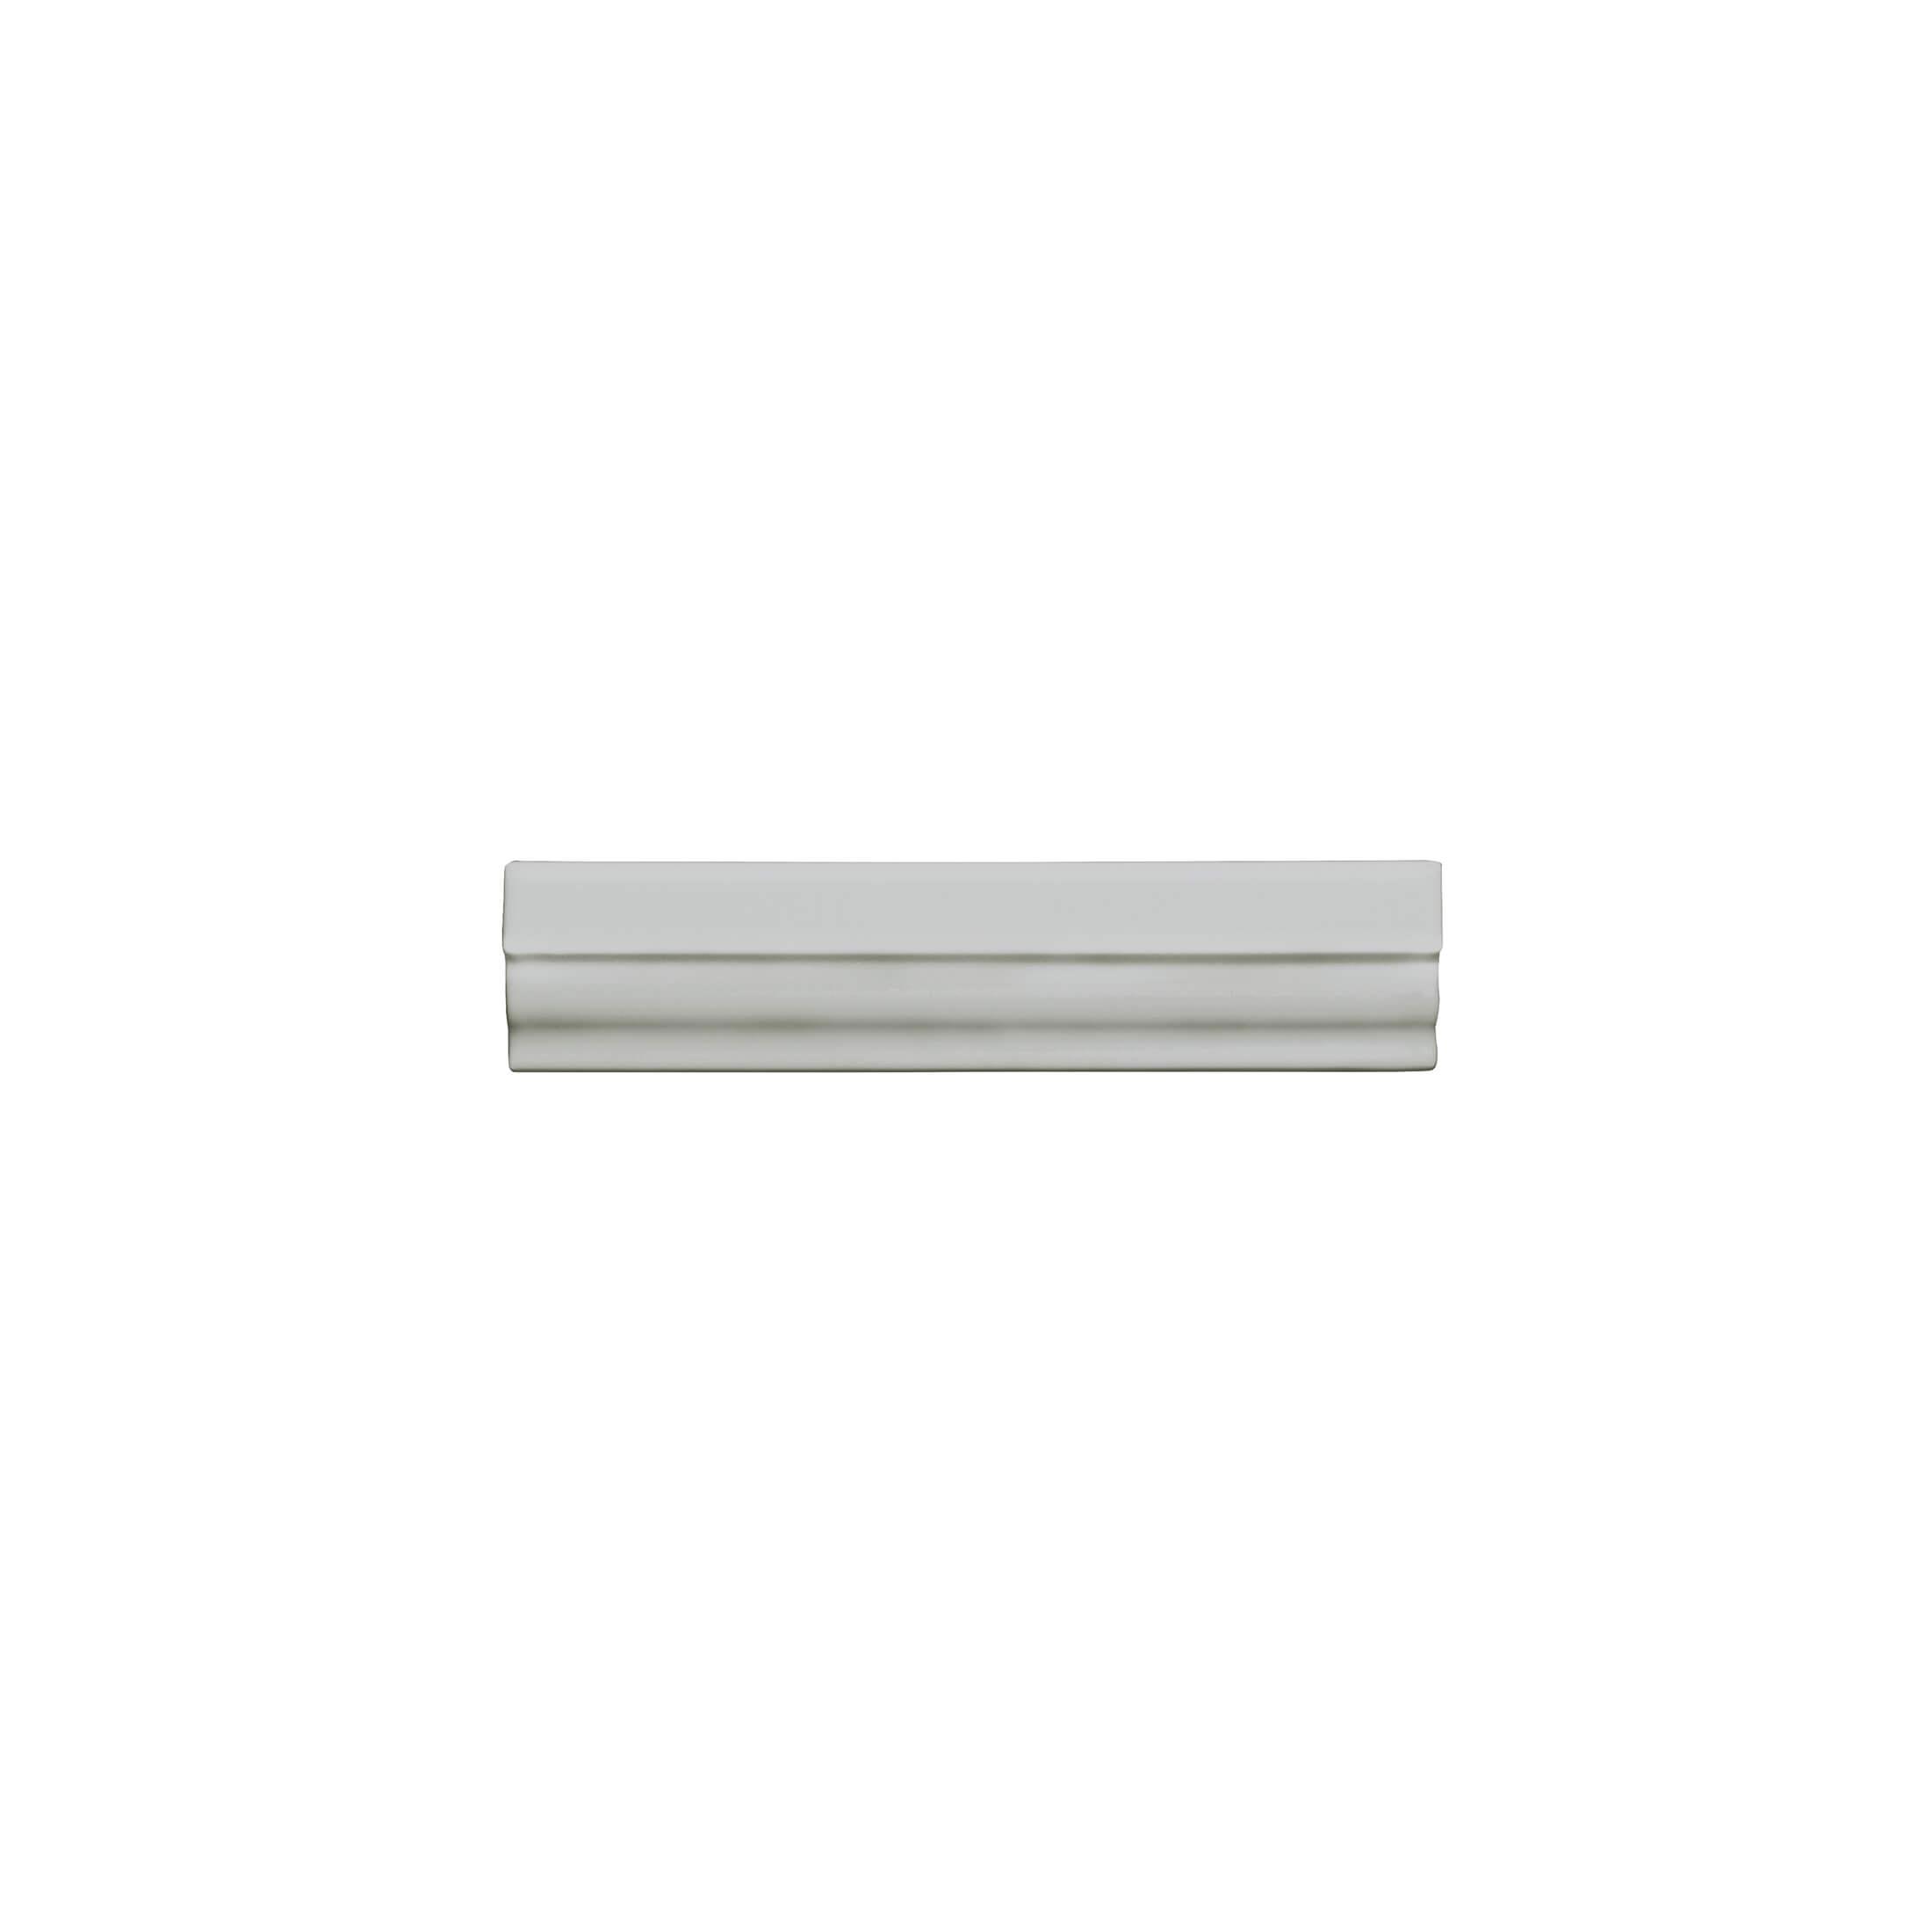 ADNE5504 - CORNISA CLASICA - 3,5 cm X 15 cm